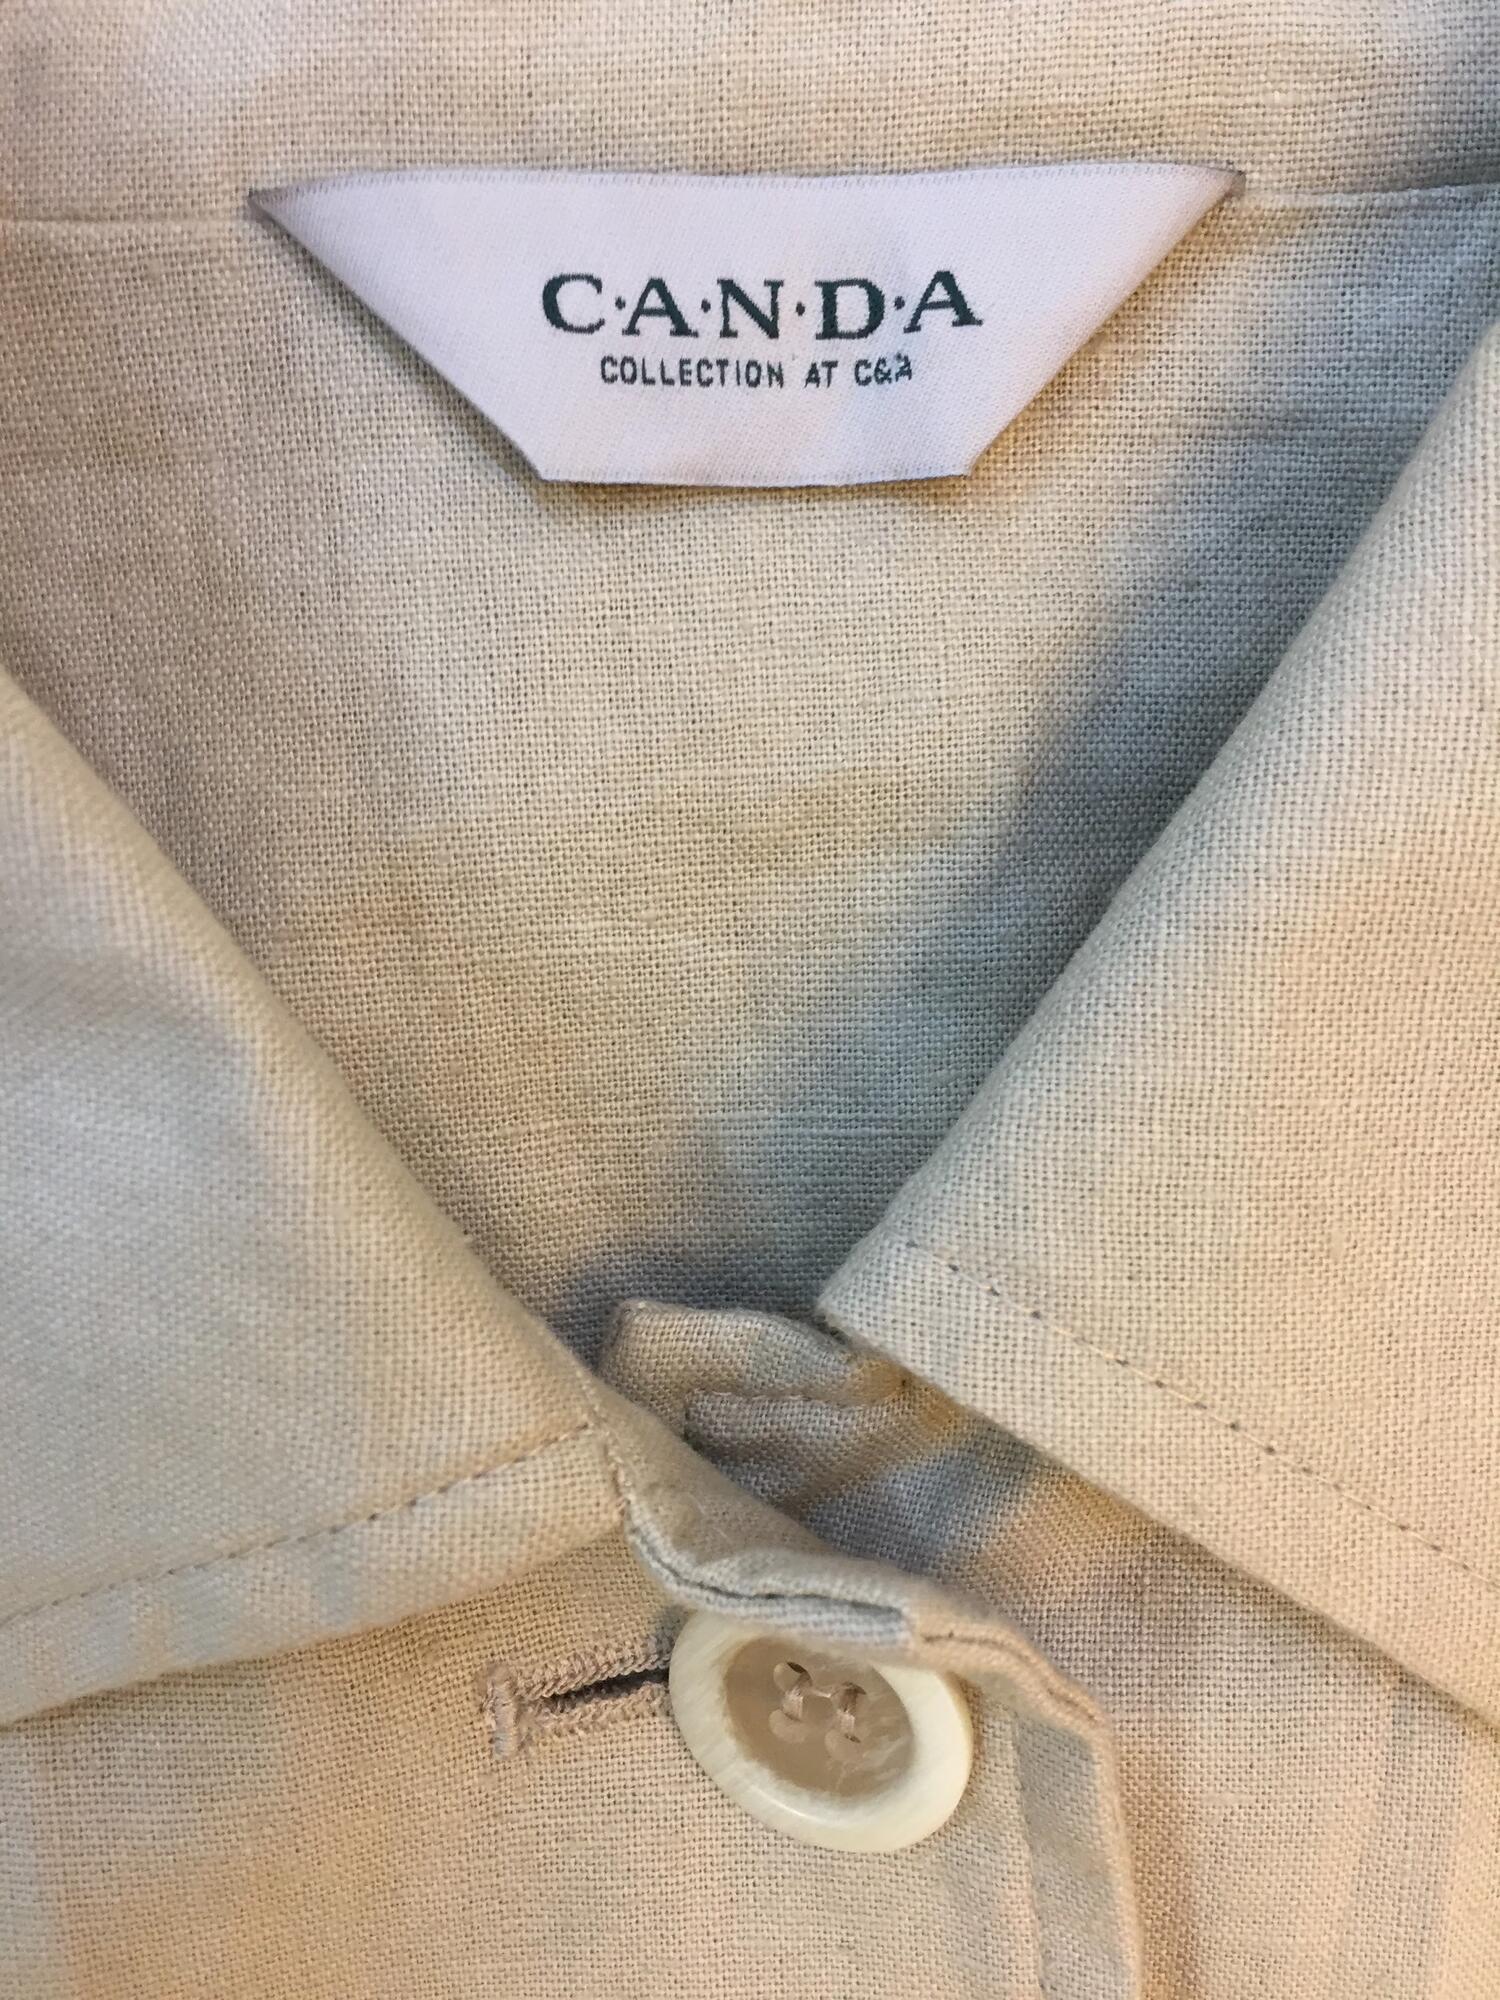 Marynarka safari CANDA lniana - Vintage Store | JestemSlow.pl